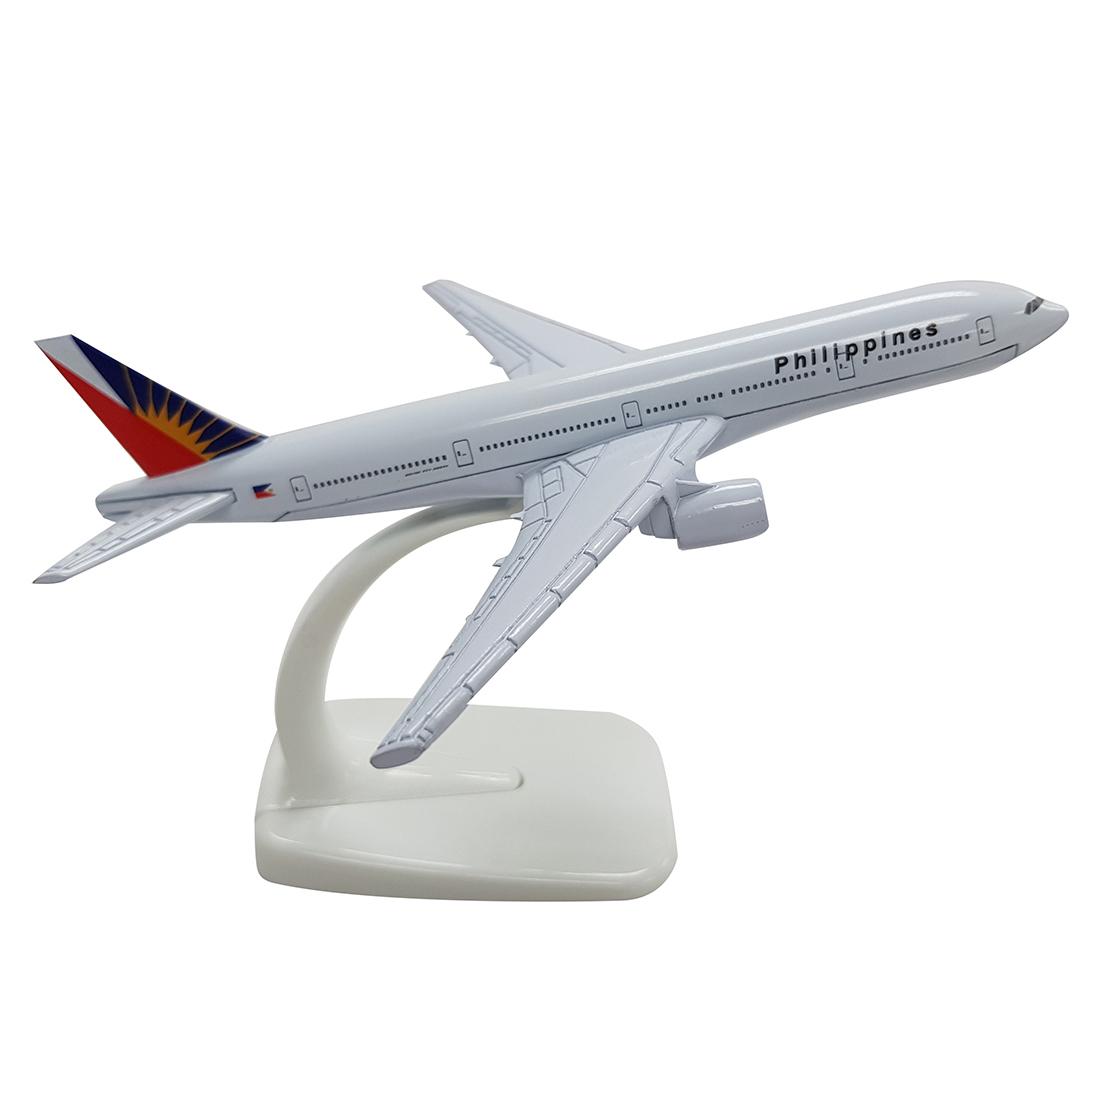 PAL Exclusives 777 Die-cast Plane